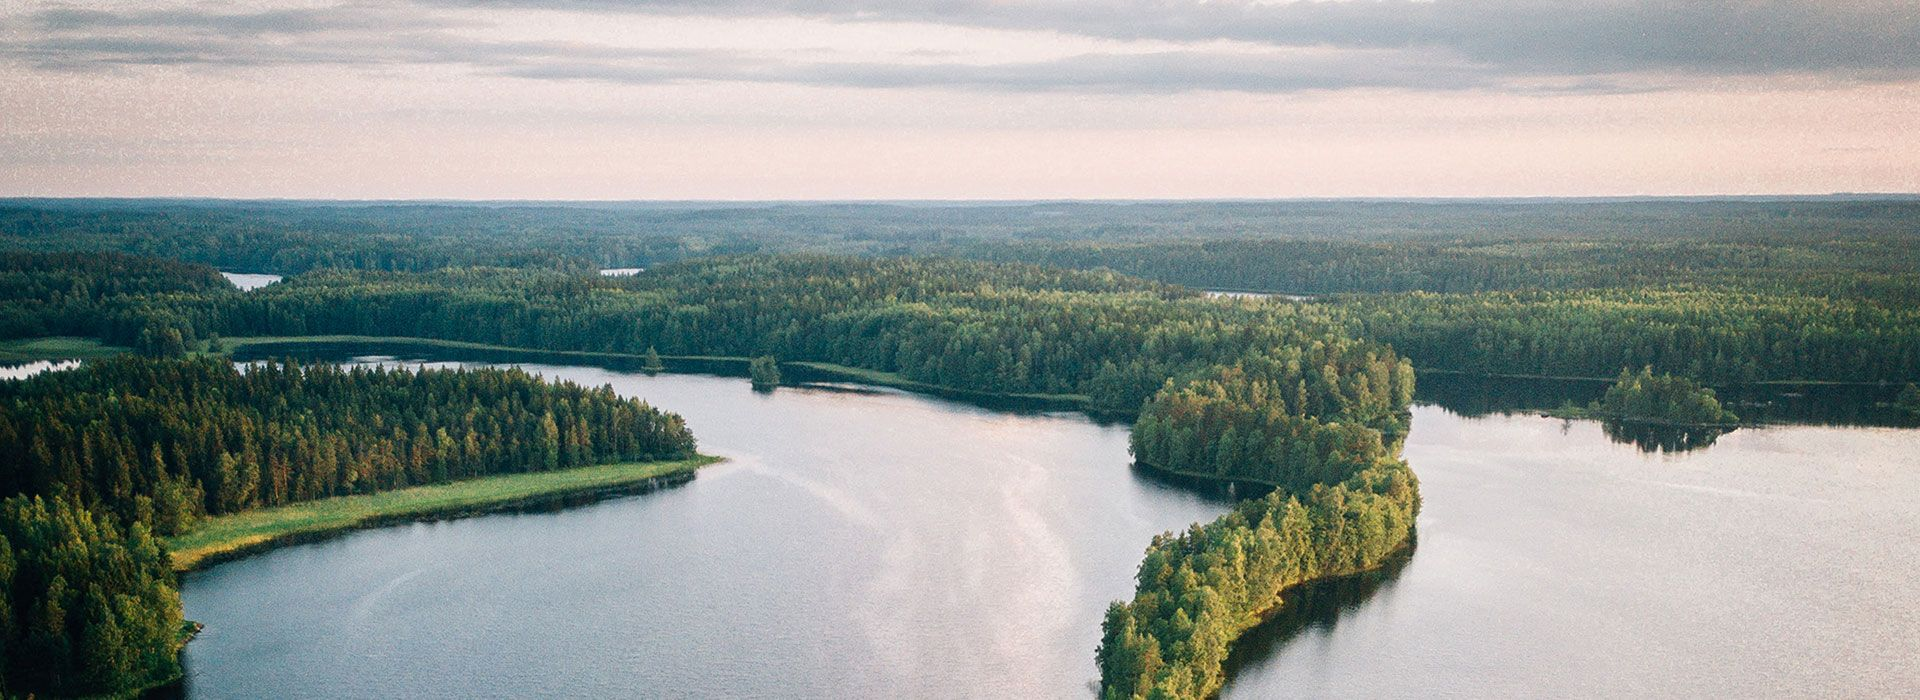 Maruili Nordic Life